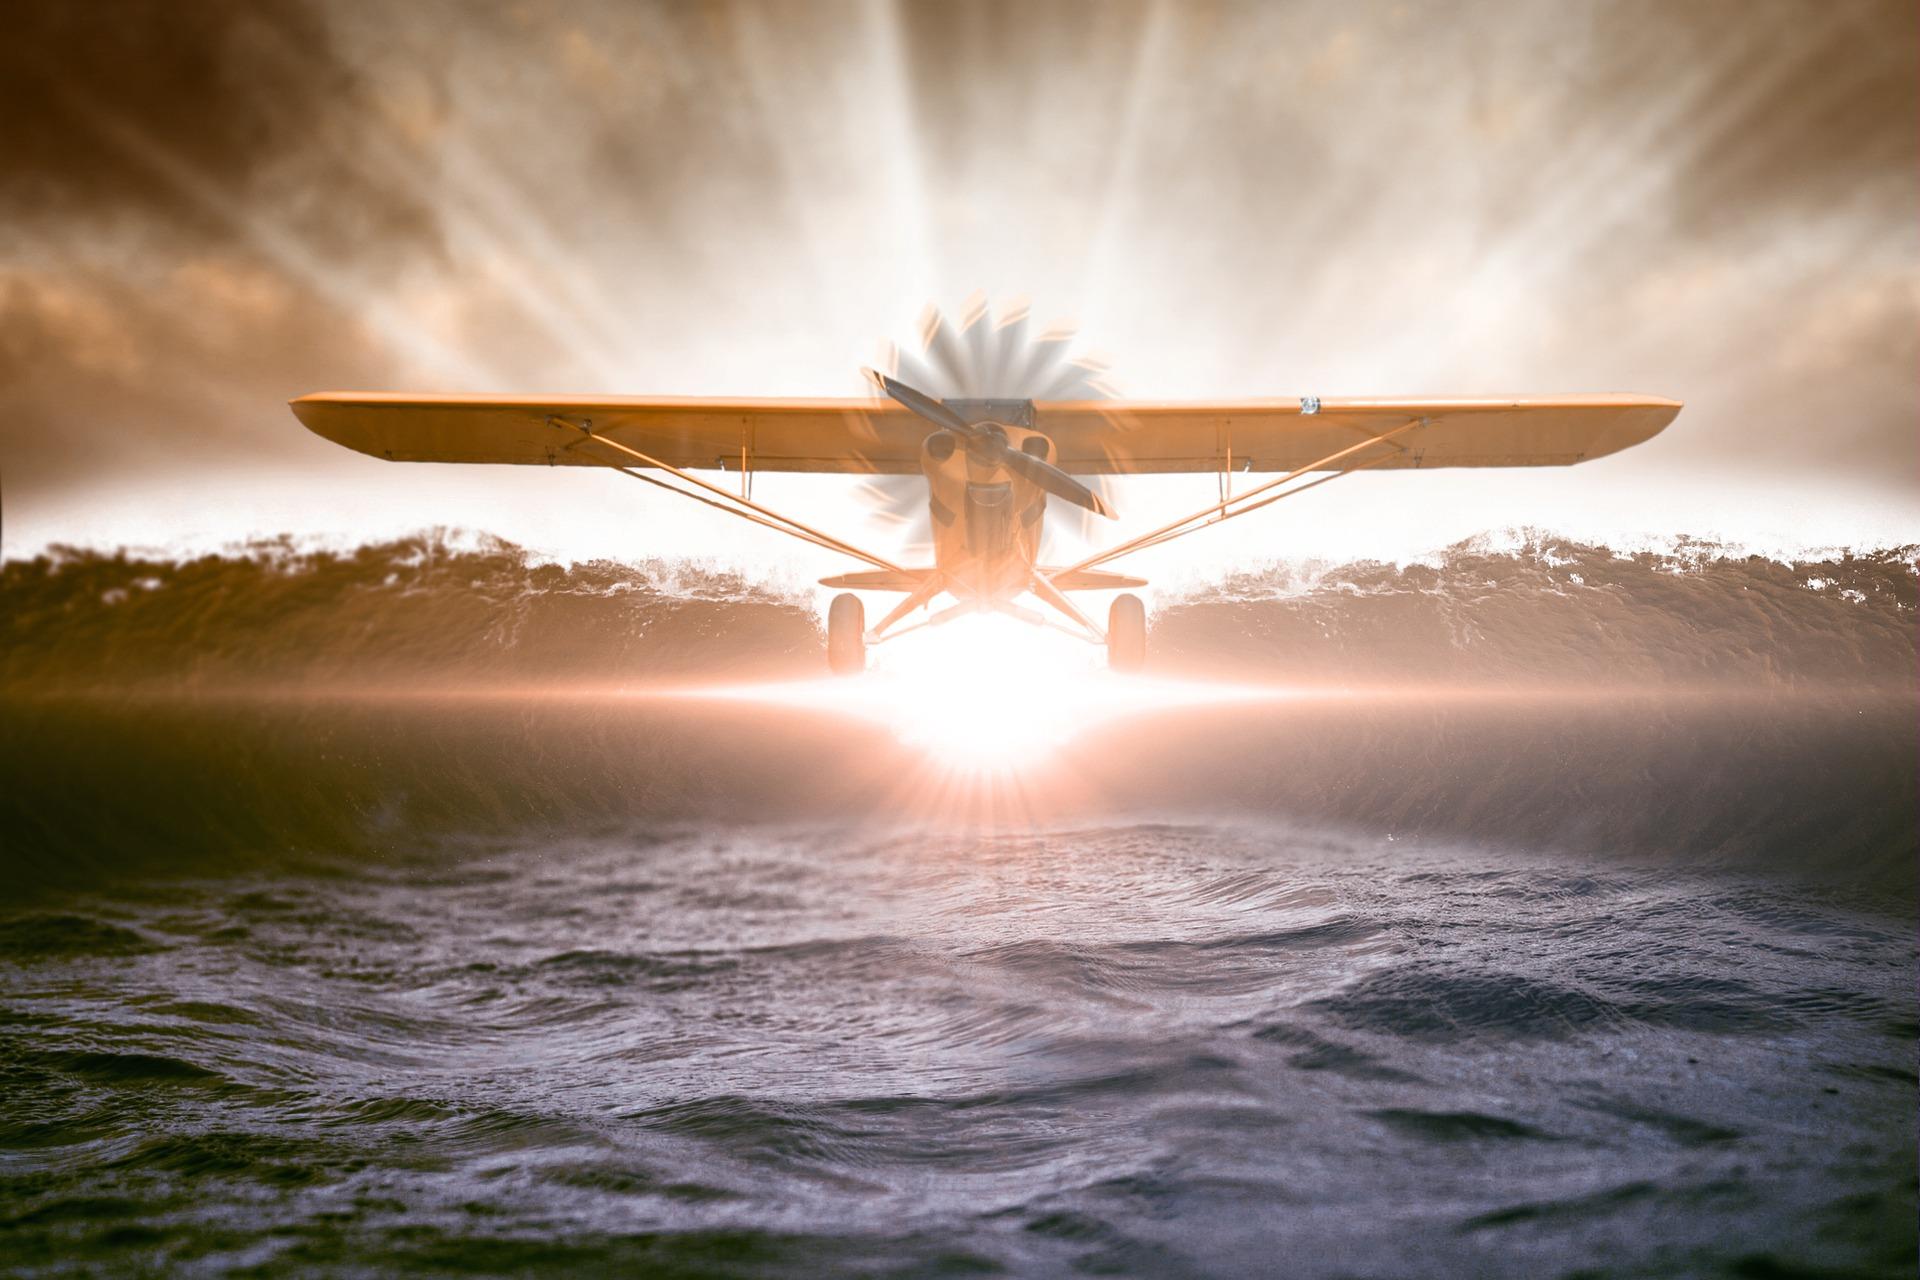 flygo aircraft image big